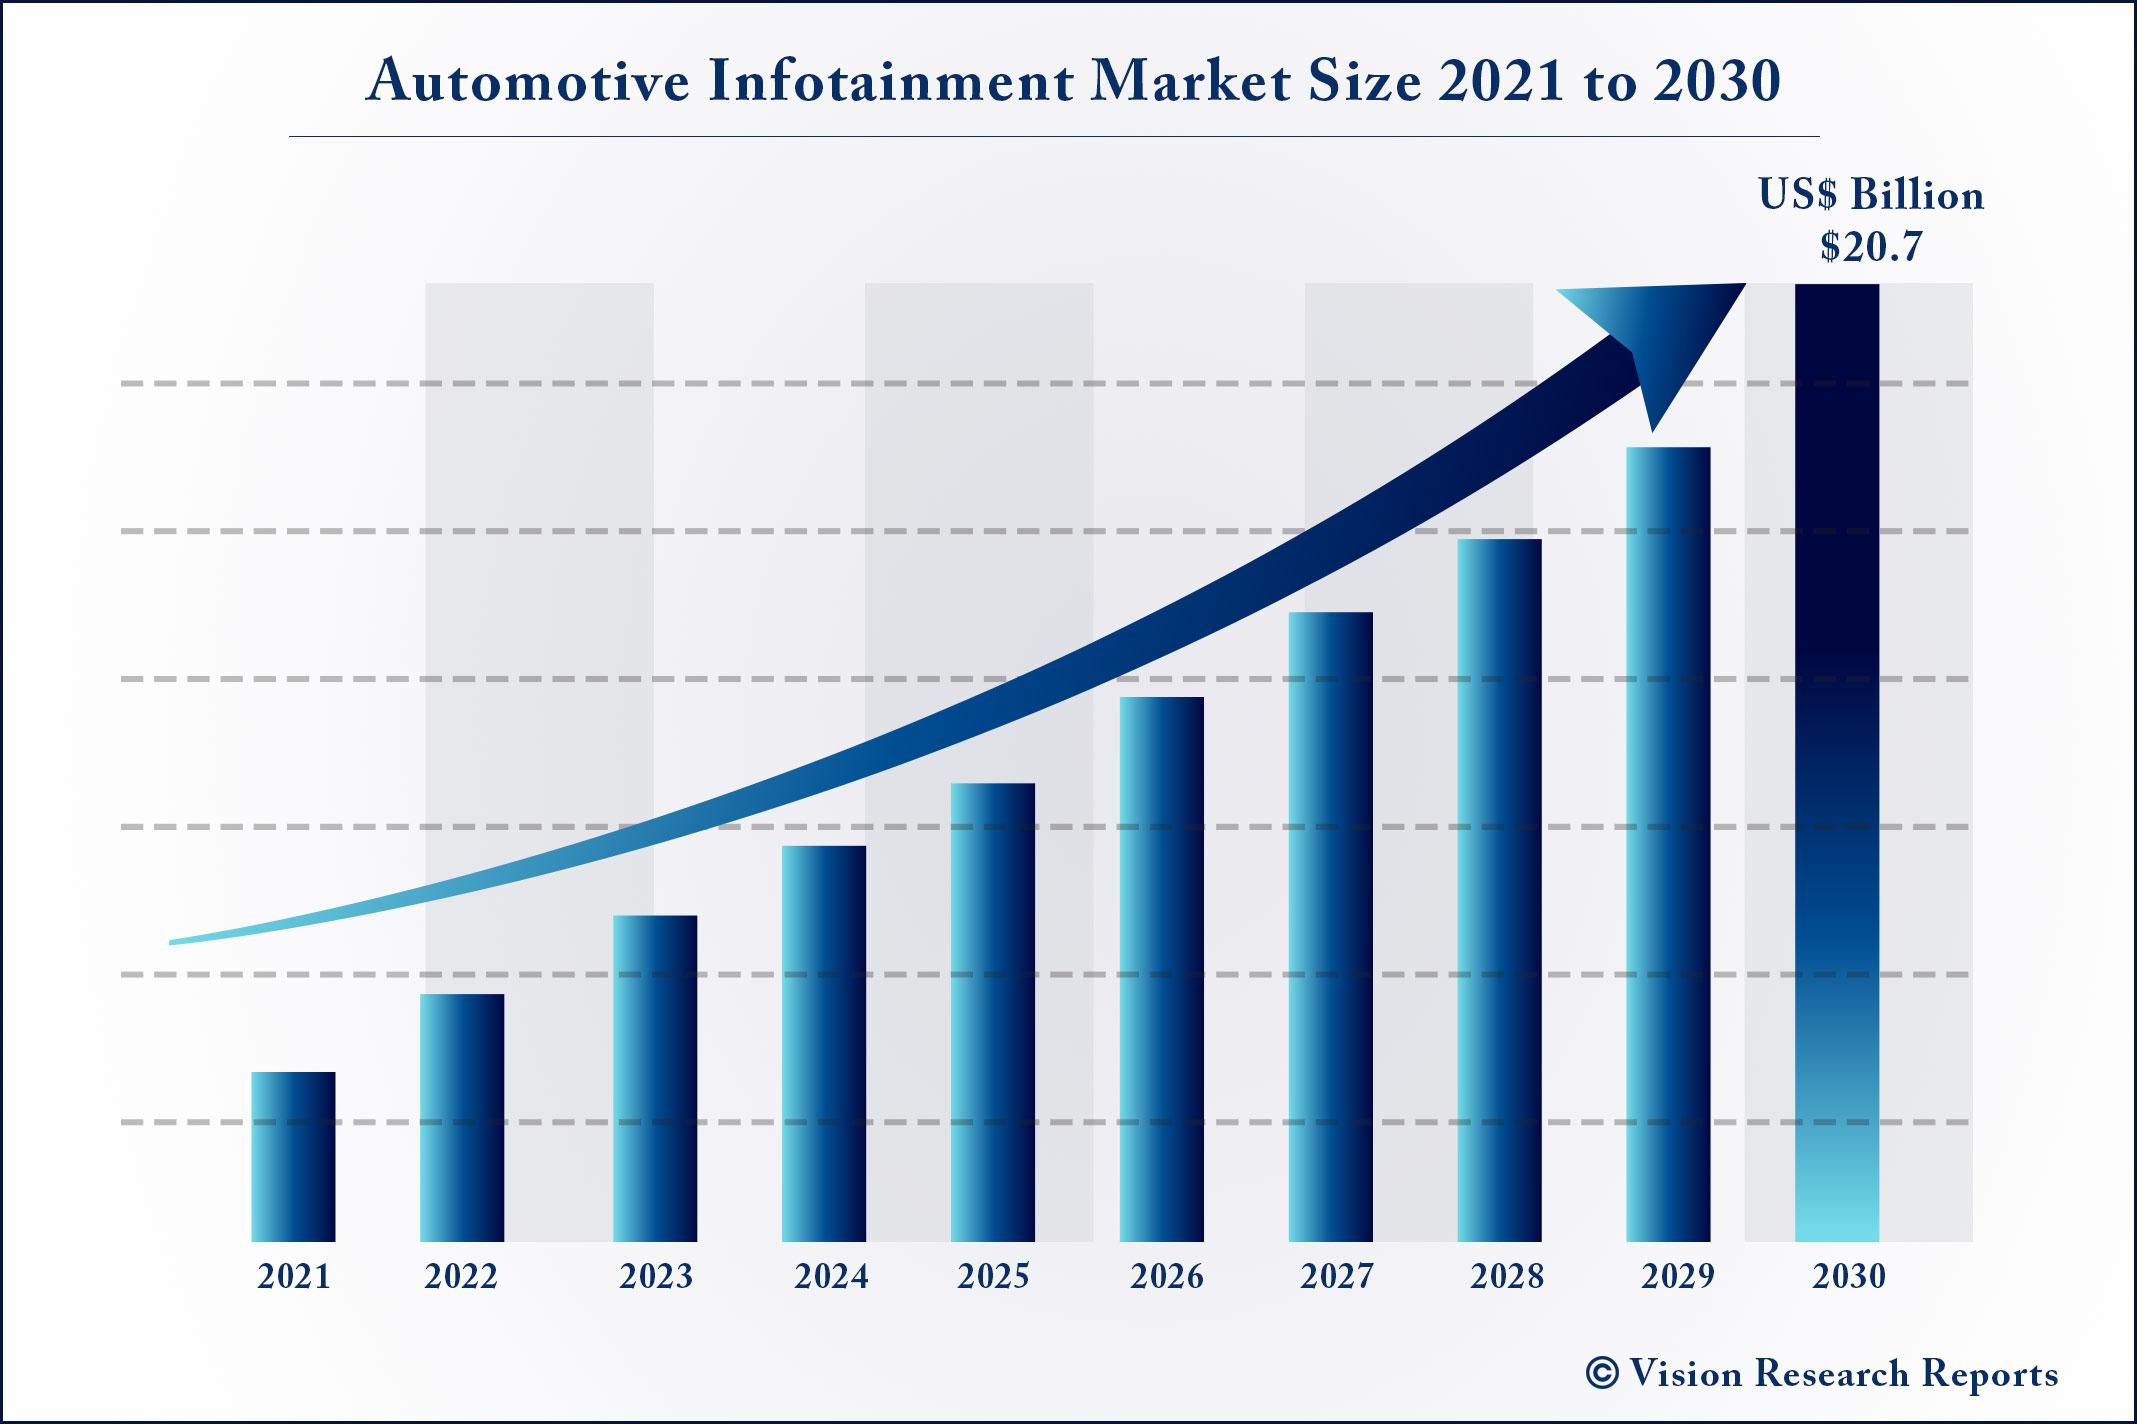 Automotive Infotainment Market Size 2021 to 2030